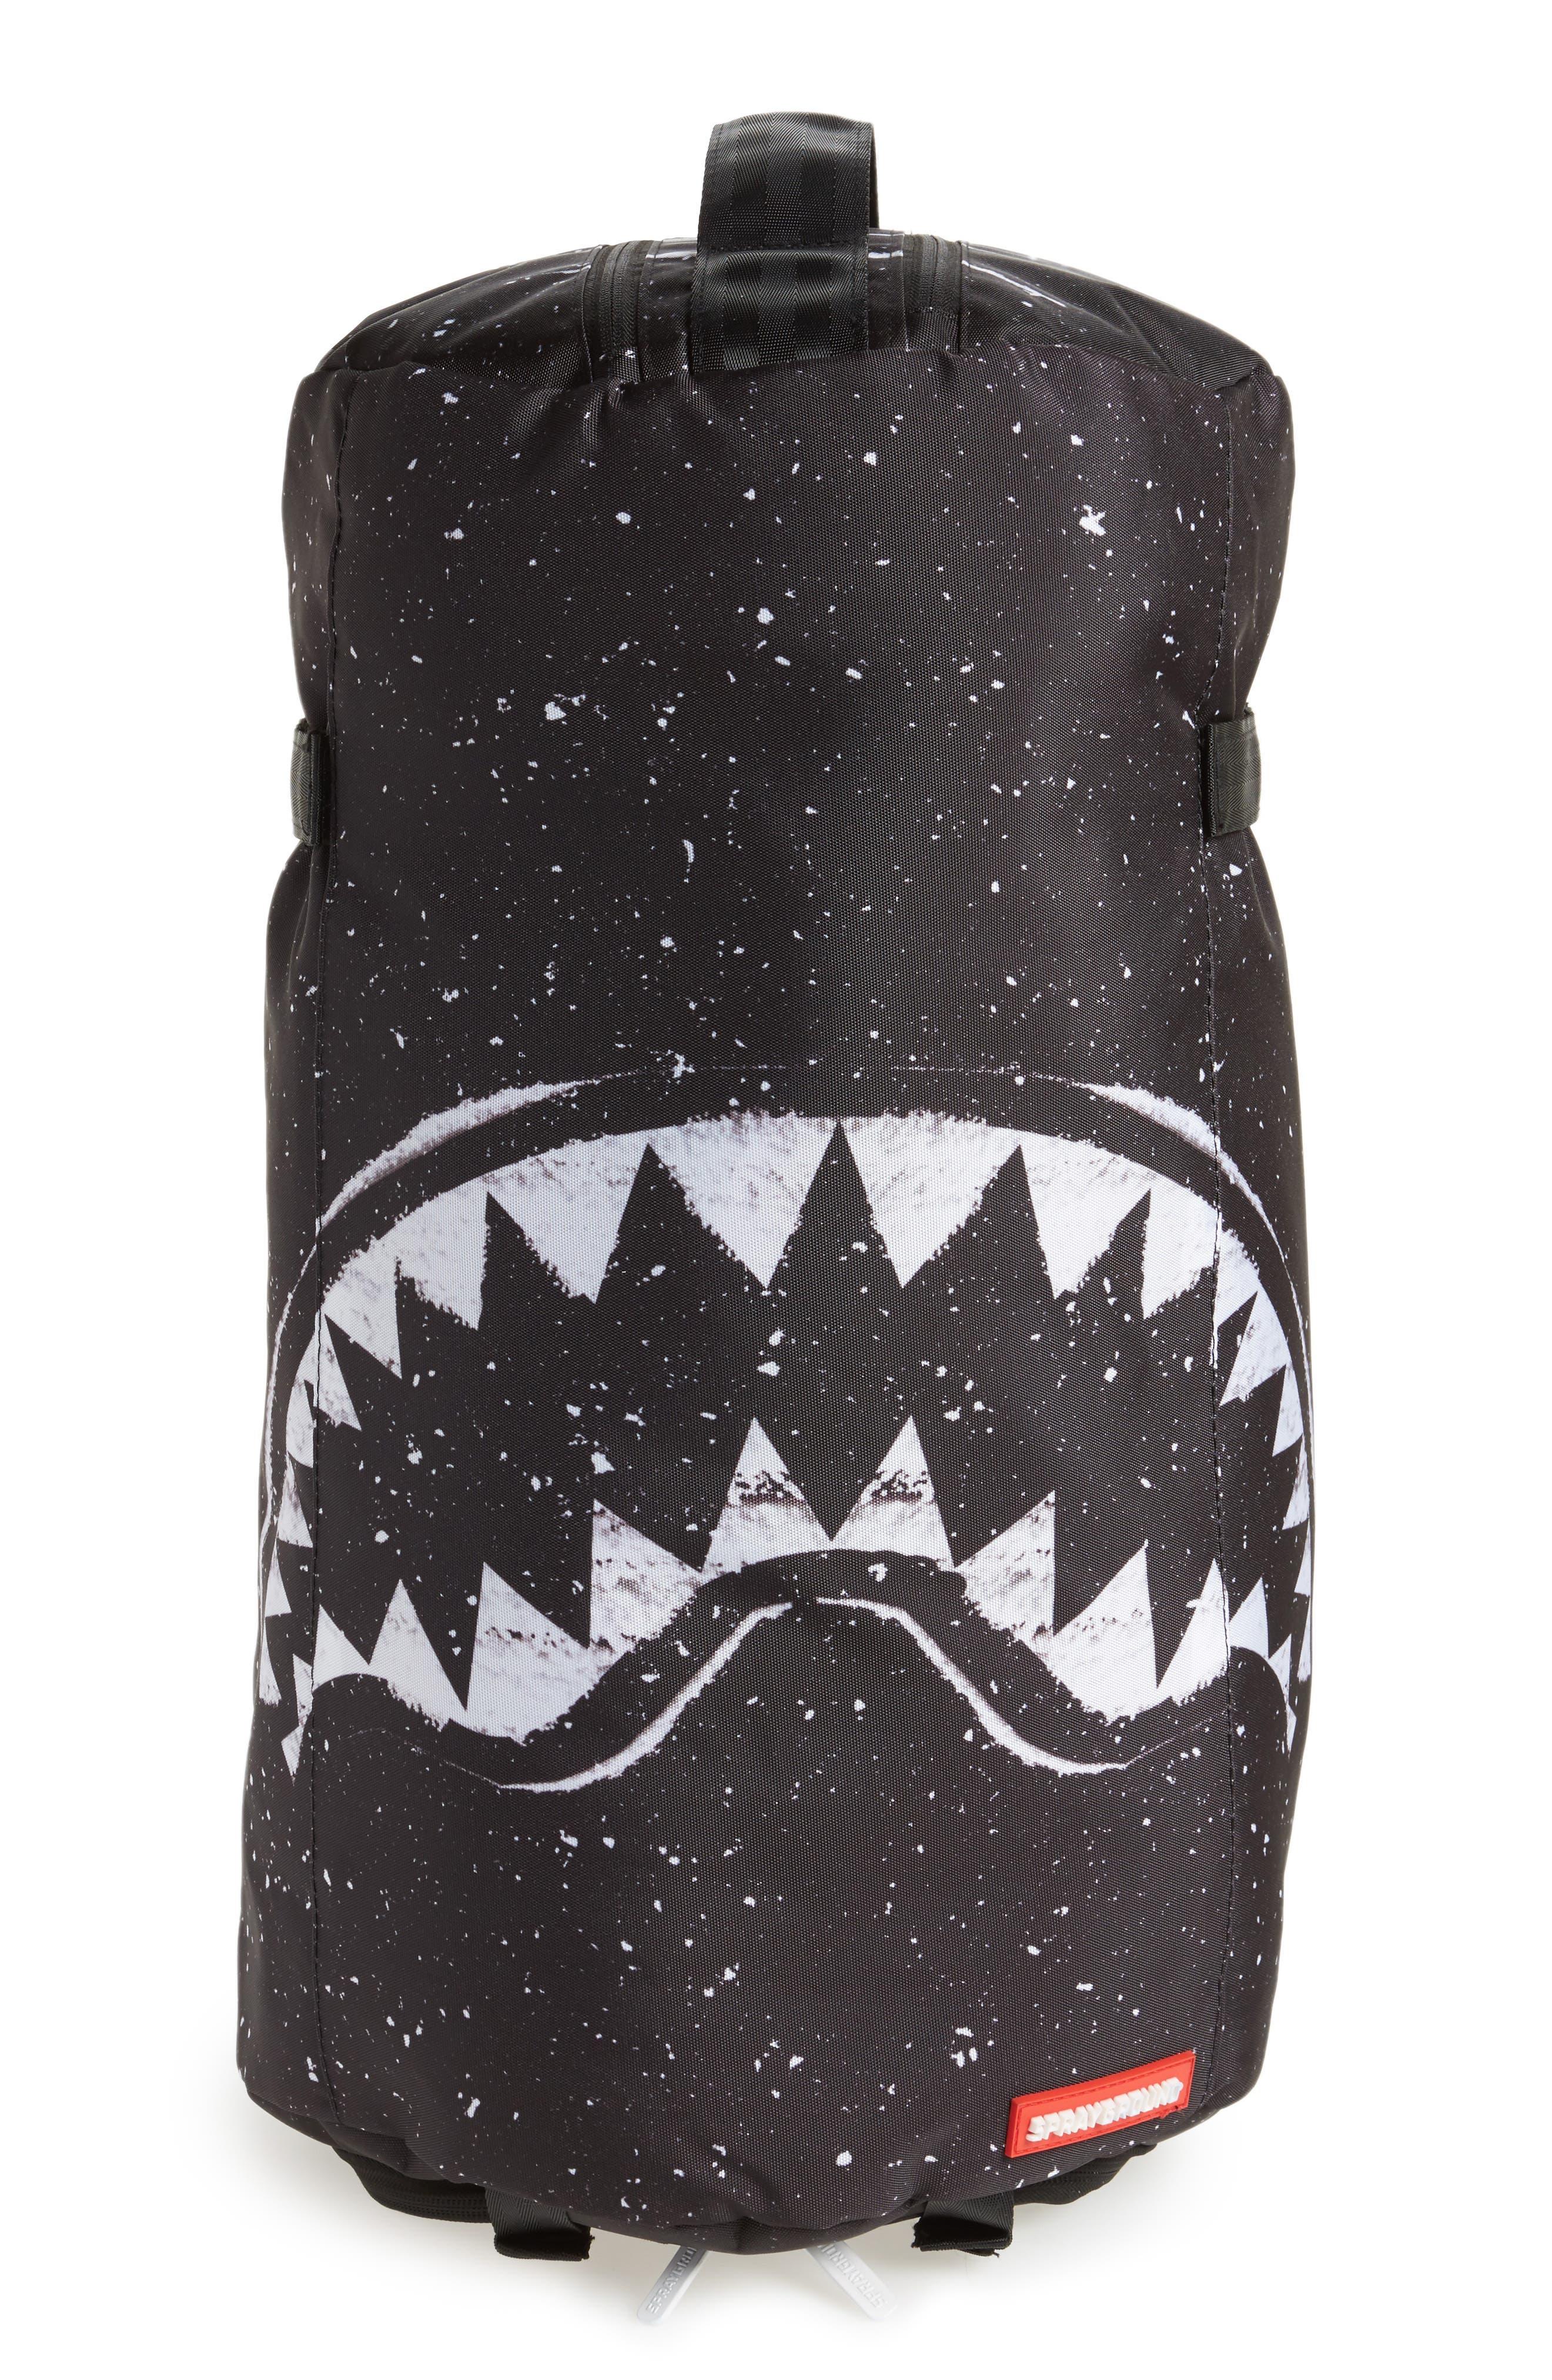 Party Shark Duffpack,                             Main thumbnail 1, color,                             Black Combo